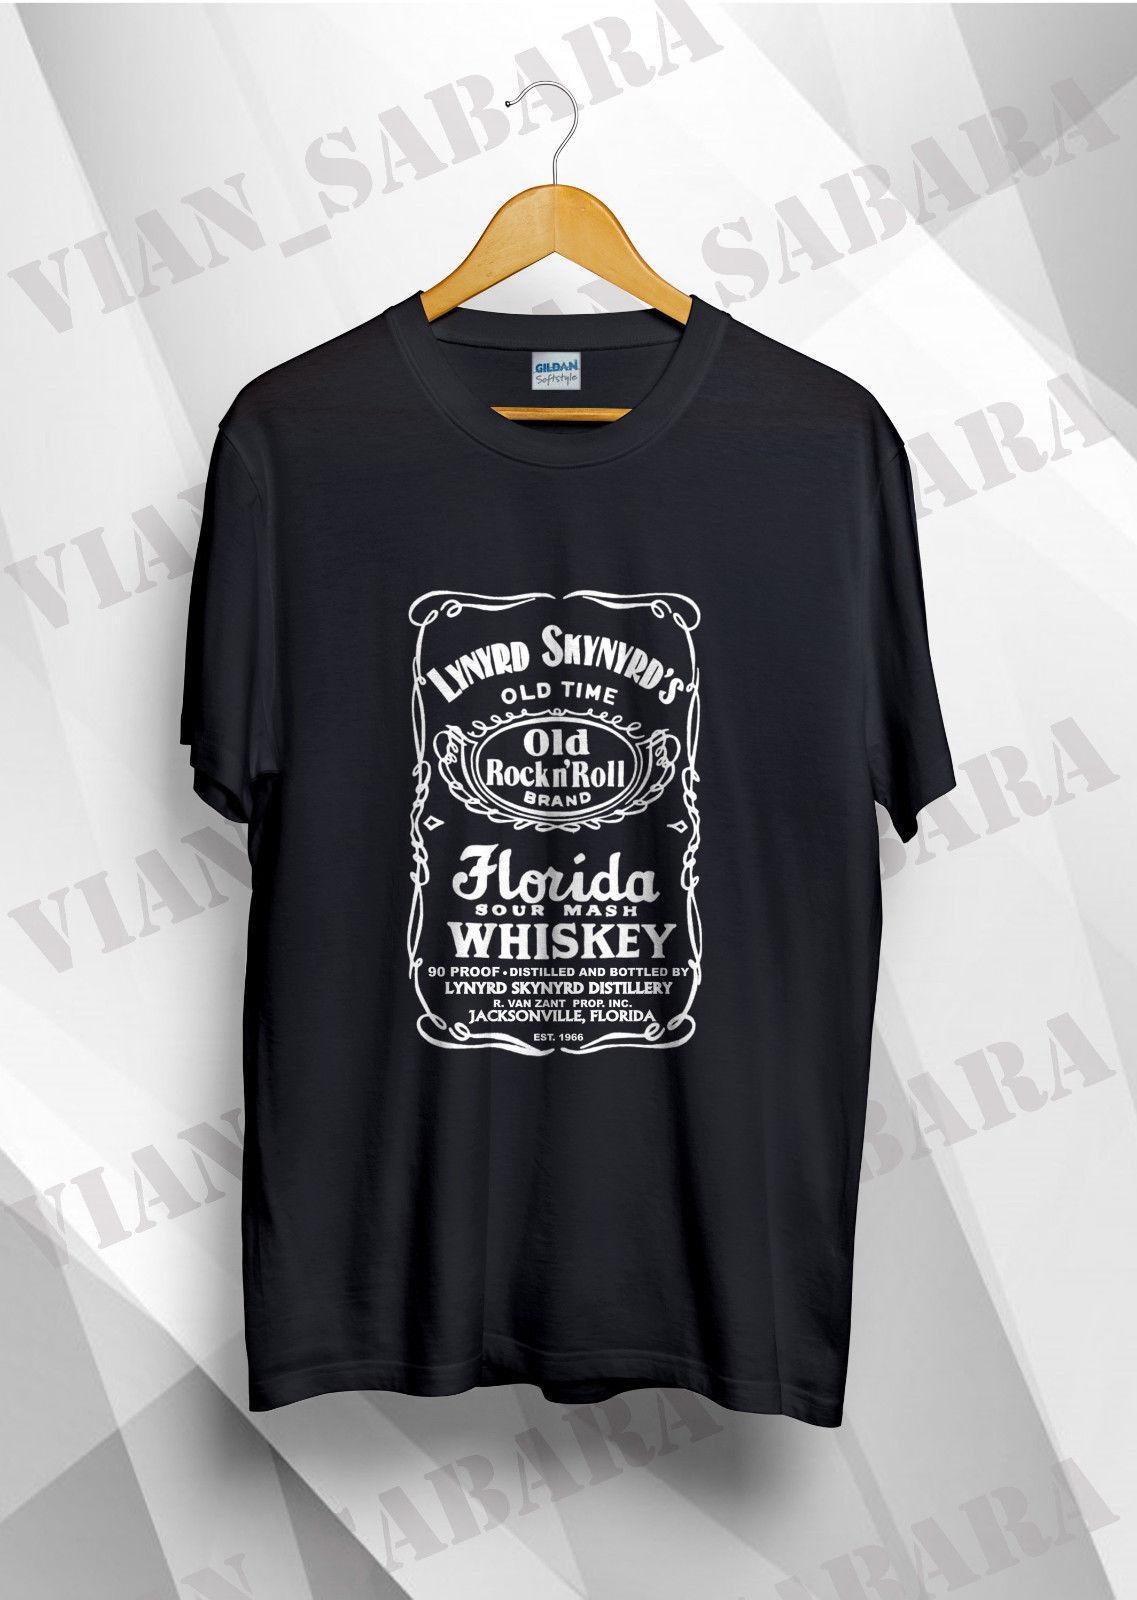 42760c2f Lynyrd Skynyrd Florida Sour Mash Whiskey Vintage T Shirt Reprint Tee Shirt  A Day Shop T Shirt Online From Beidhgate03, $11.68| DHgate.Com